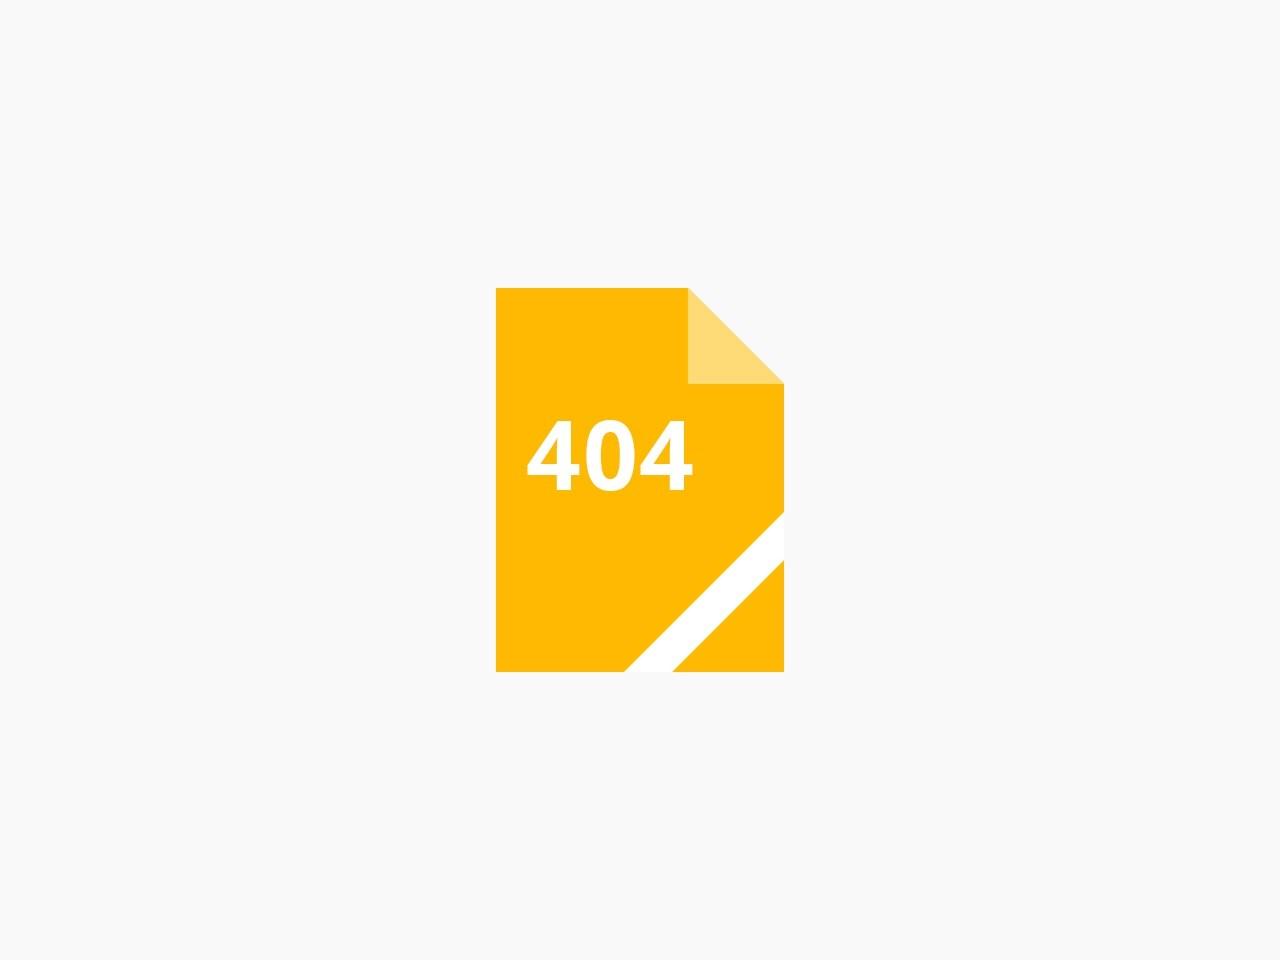 ultime-notizie-italia